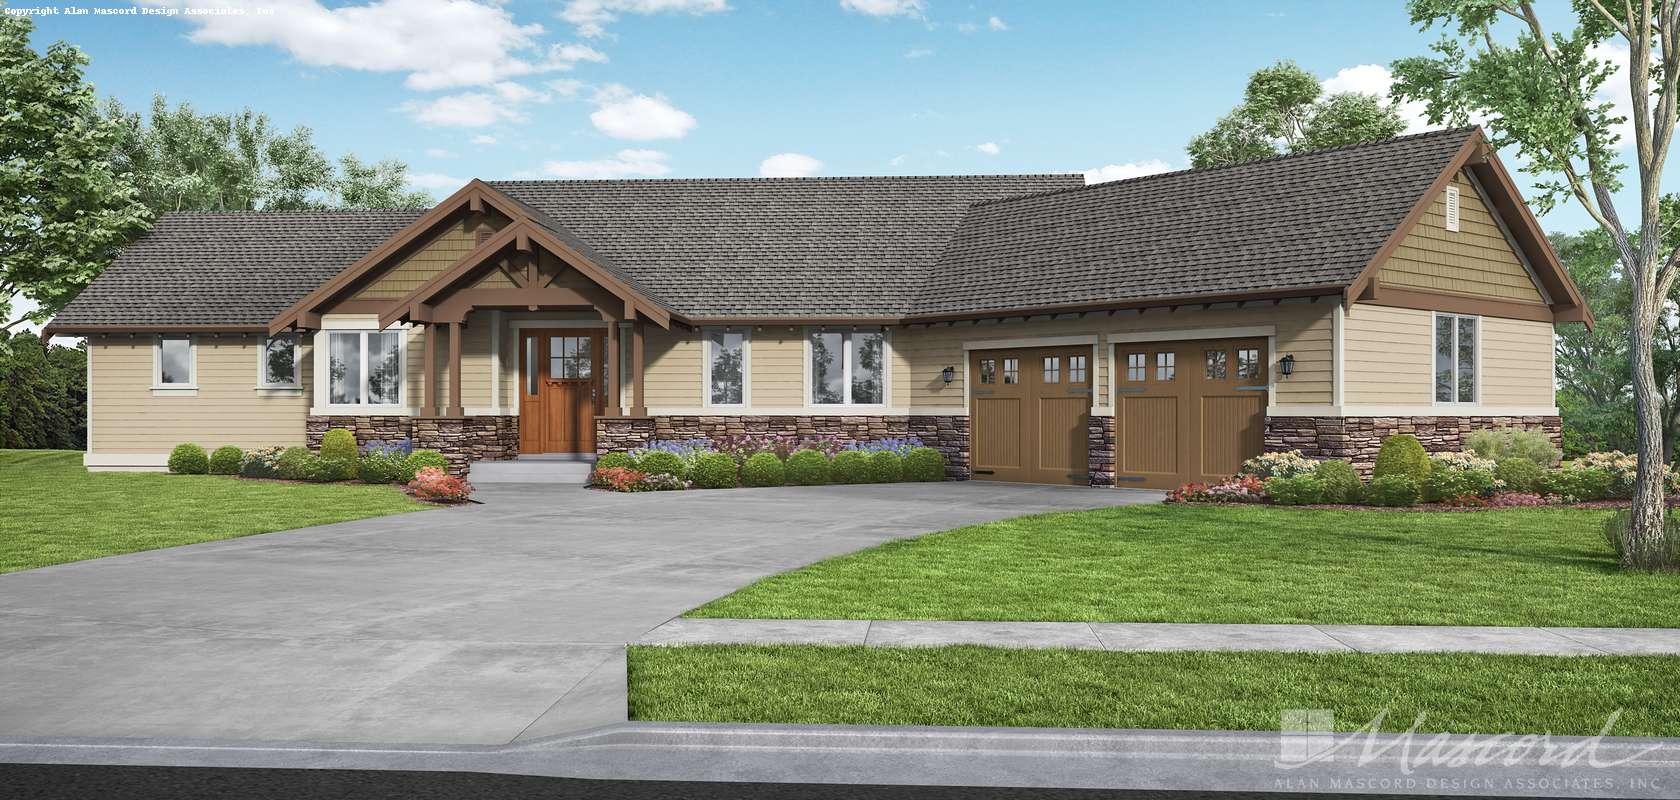 Mascord House Plan 22156G: The Blythewood